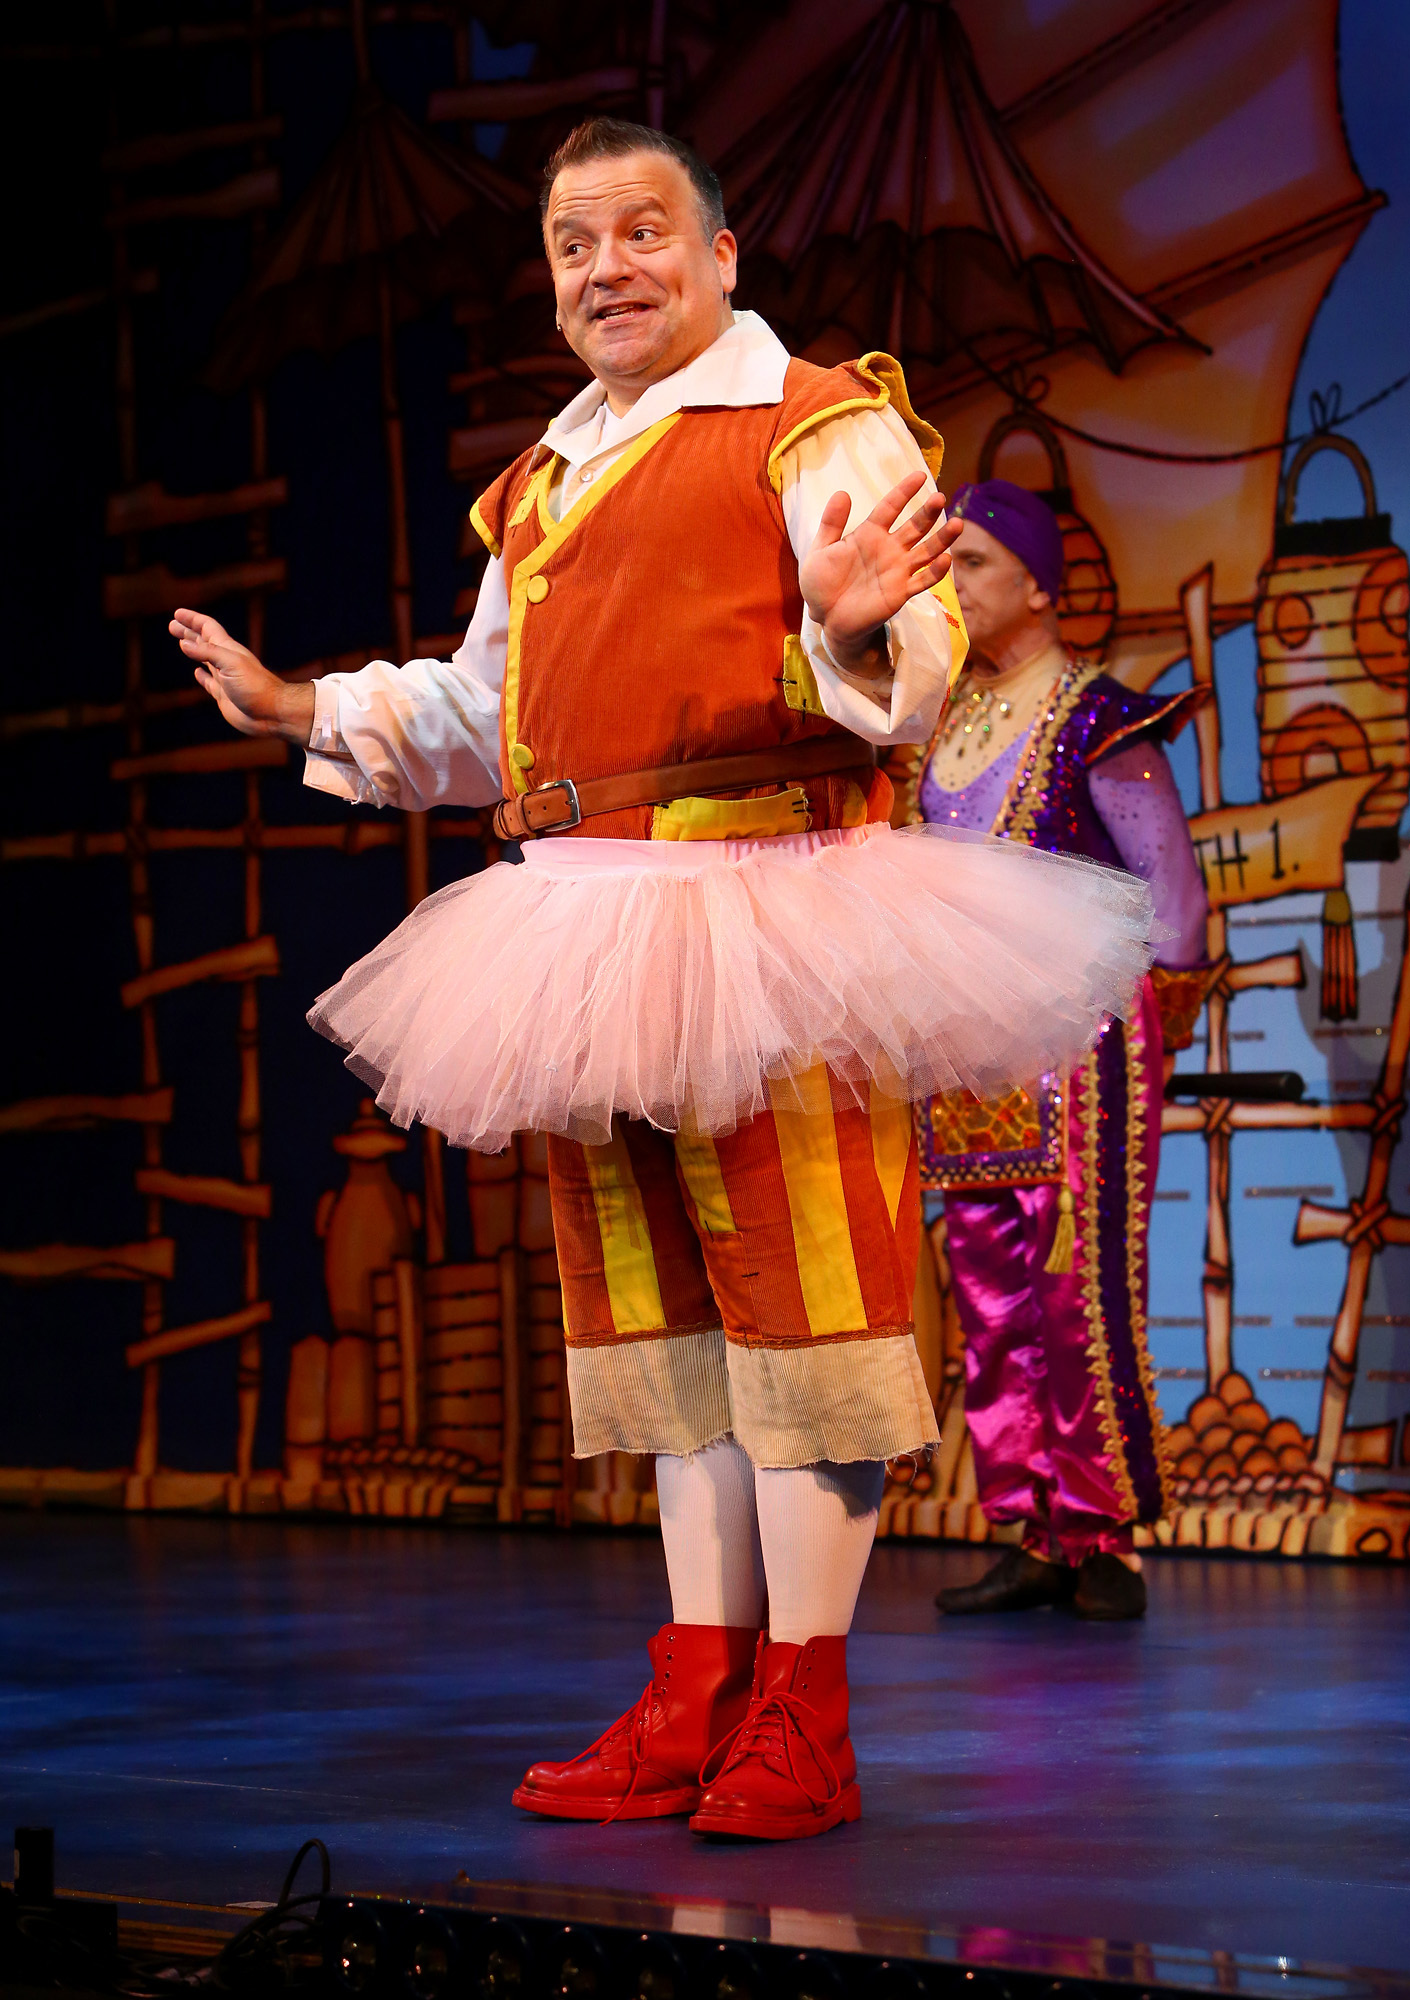 Aladdin. Kev Orkian wearing a tutu. Milton Keynes Theatre pantomime, Christmas 2015. Aladdin stars Priscilla Presley, Gary Wilmot, Ben Adams, Wayne Sleep, Kev Orkian, Mark Pickering, Aimie Atkinson and Phil Holden.